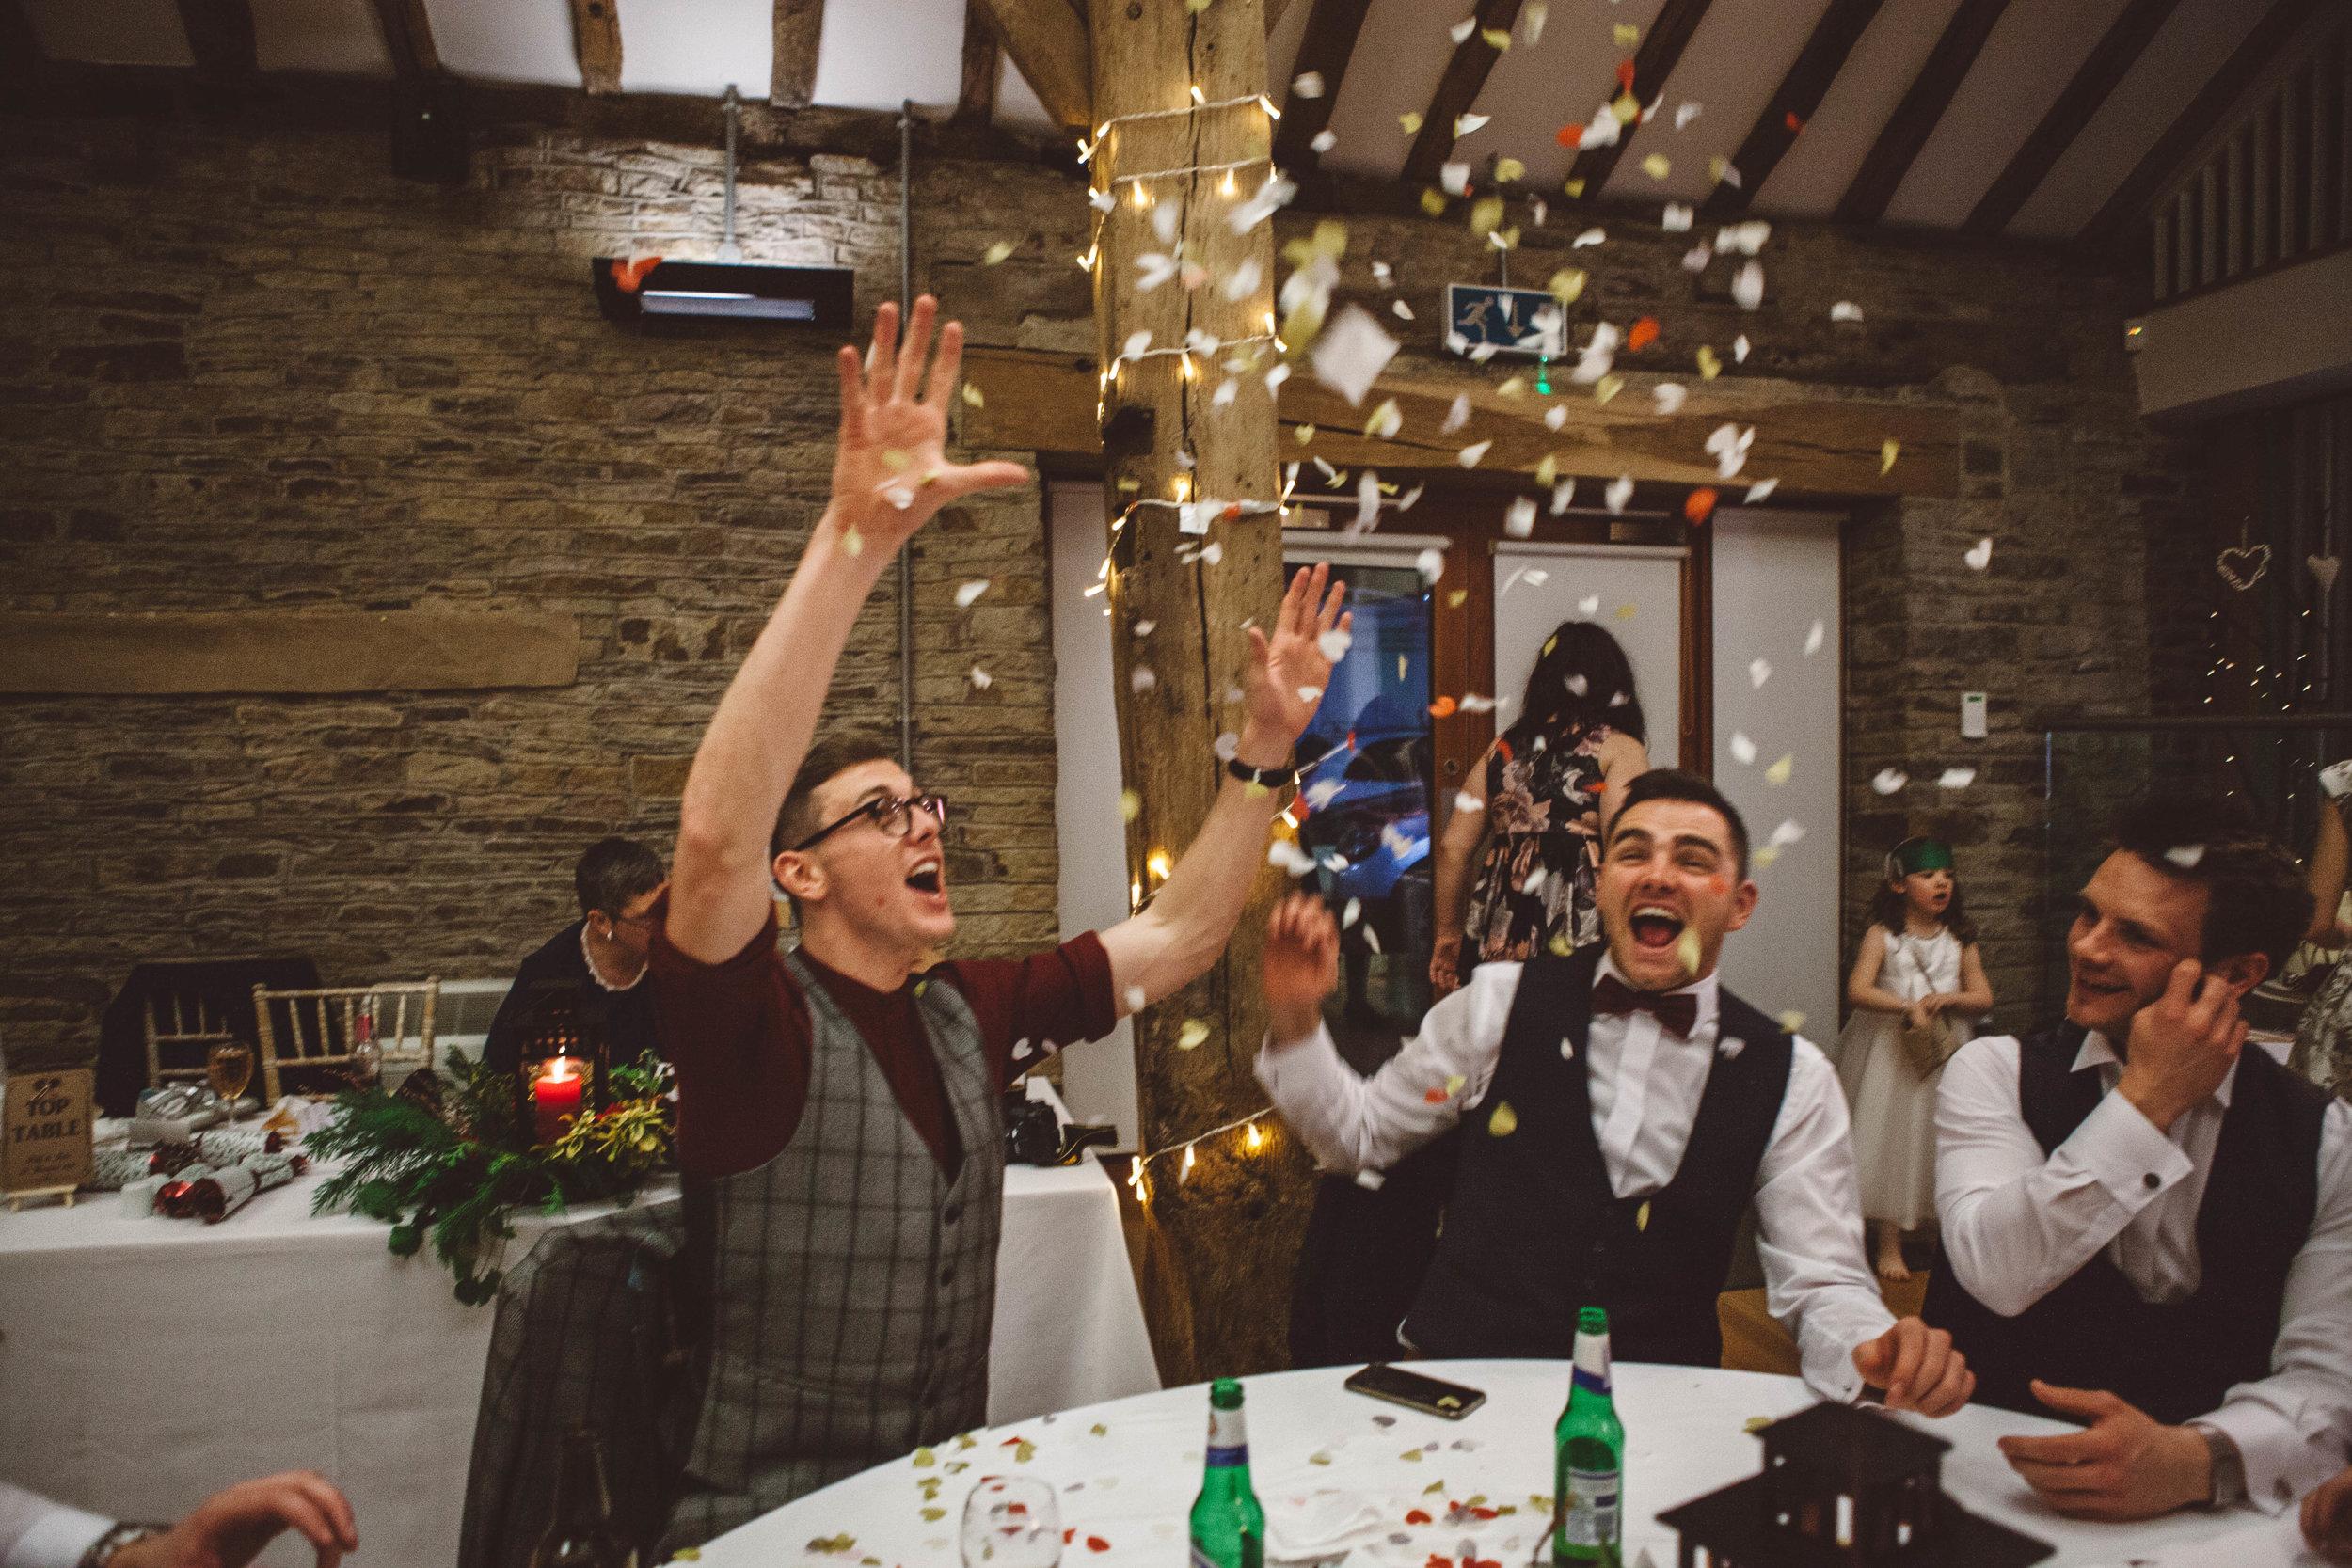 The-Northorpe-Barn-Wedding-Photography-2017-10.jpg